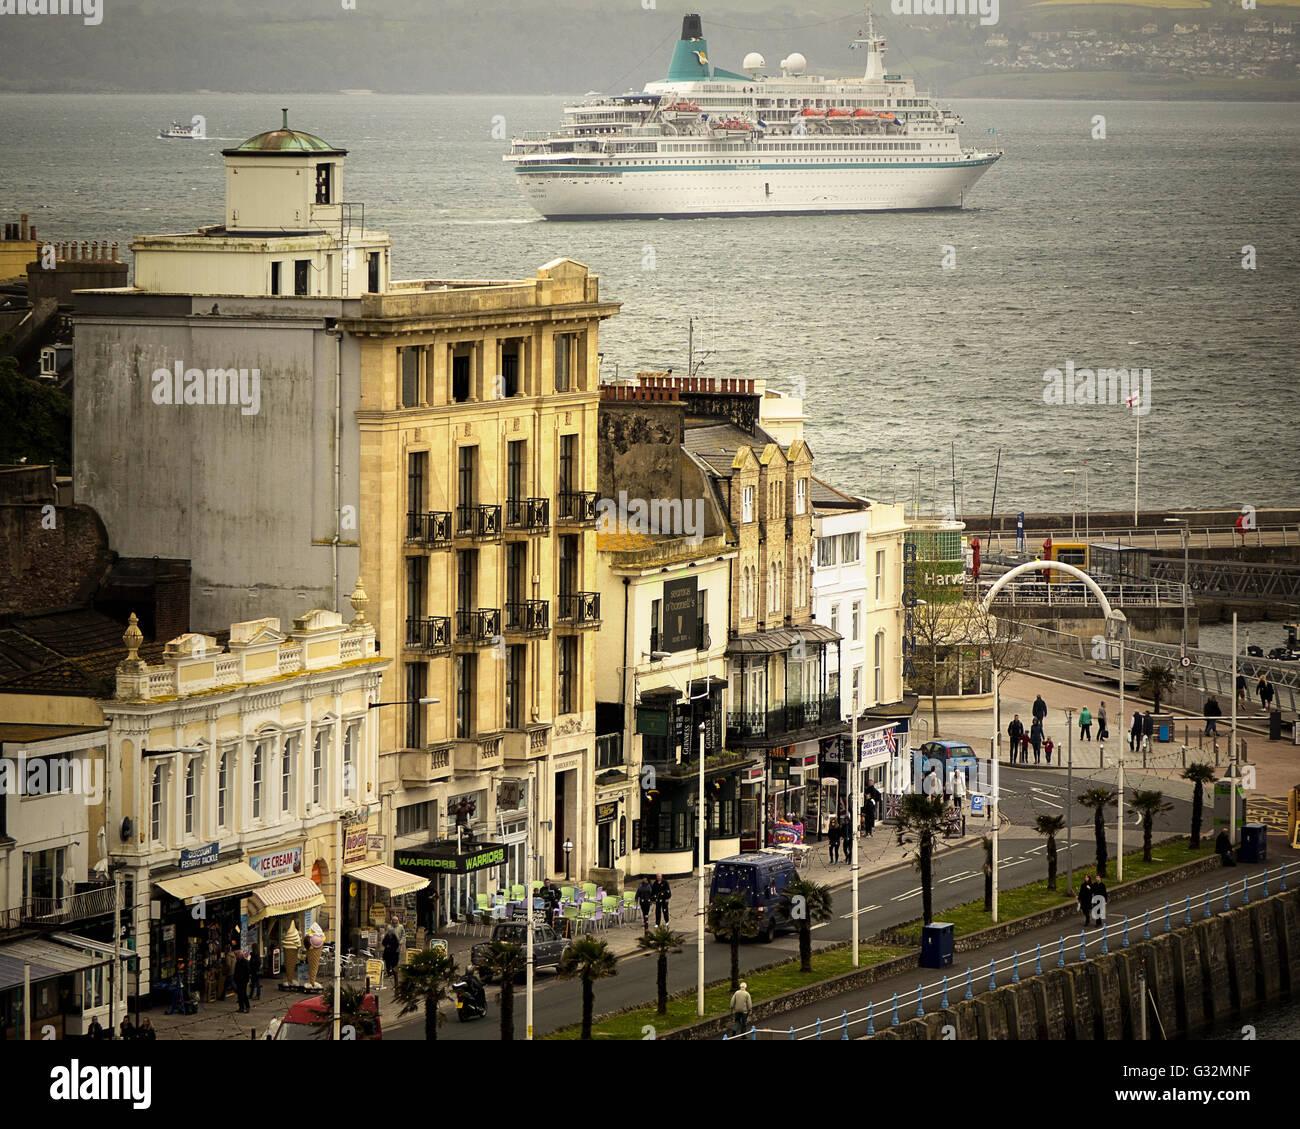 GB - DEVON: The German cruise liner MS Albatros off Torquay (02 May 2016) - Stock Image